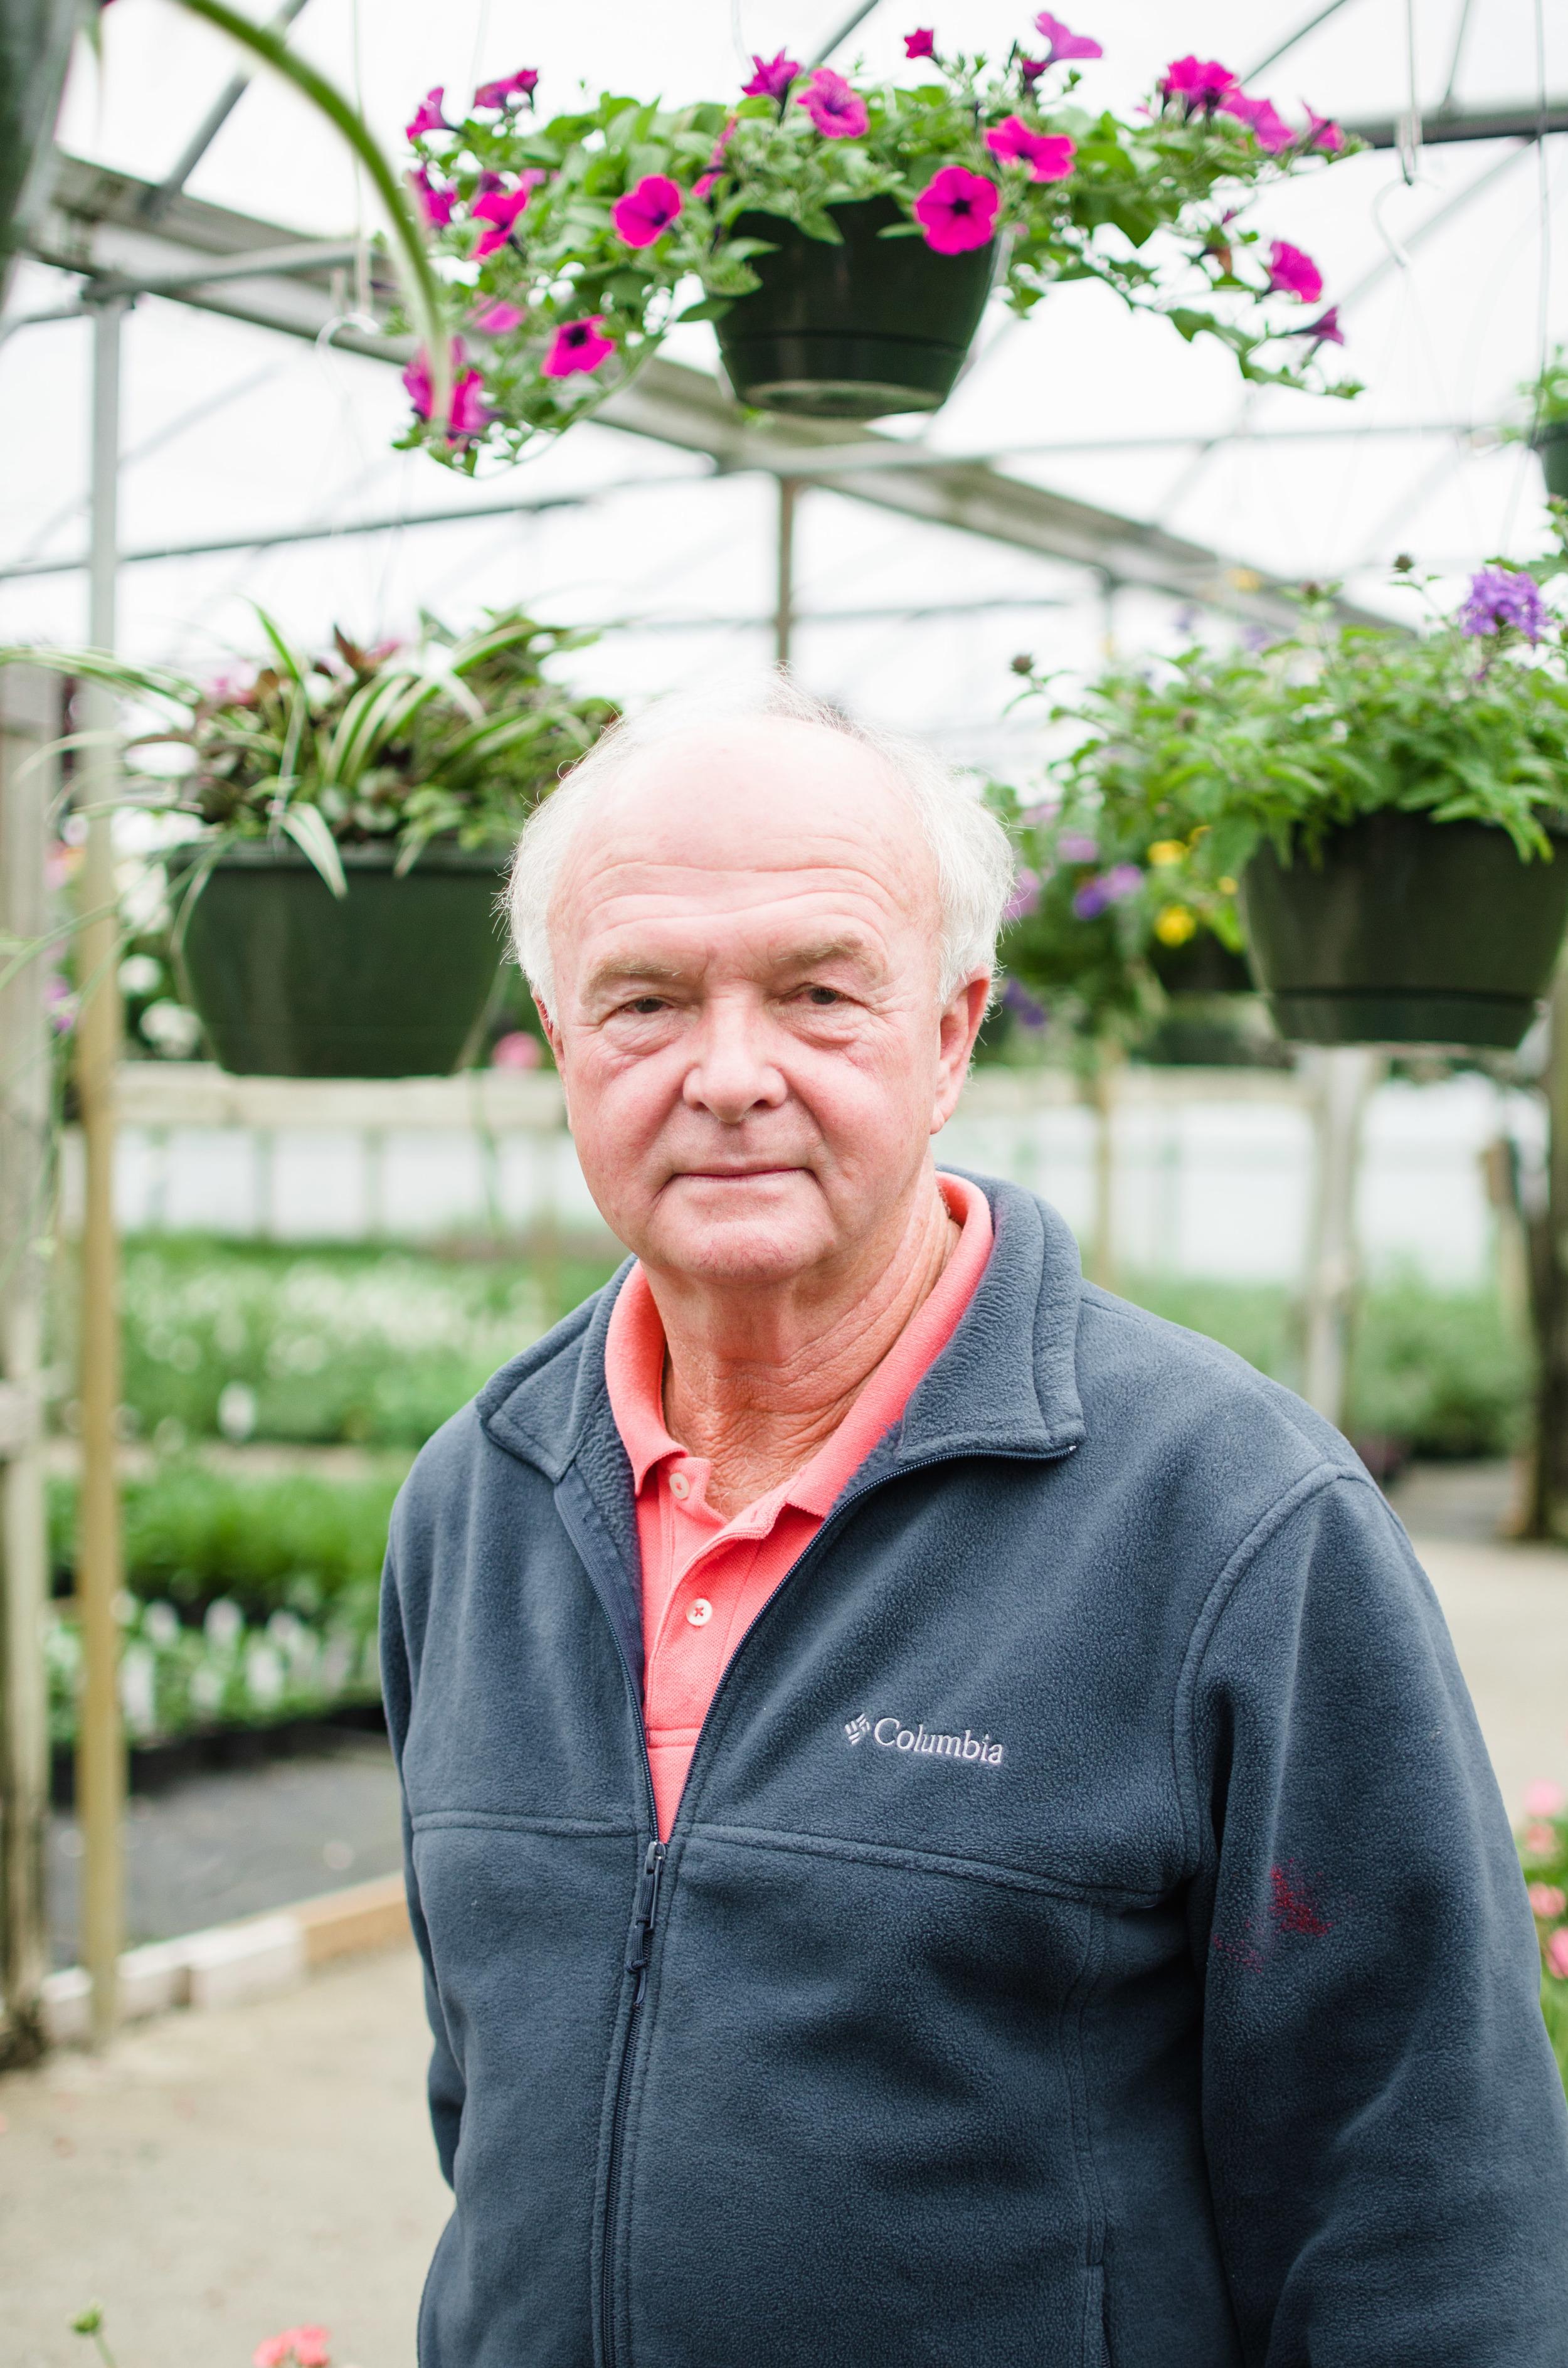 Larry Fish of Tarheel Nursery in Angier, NC